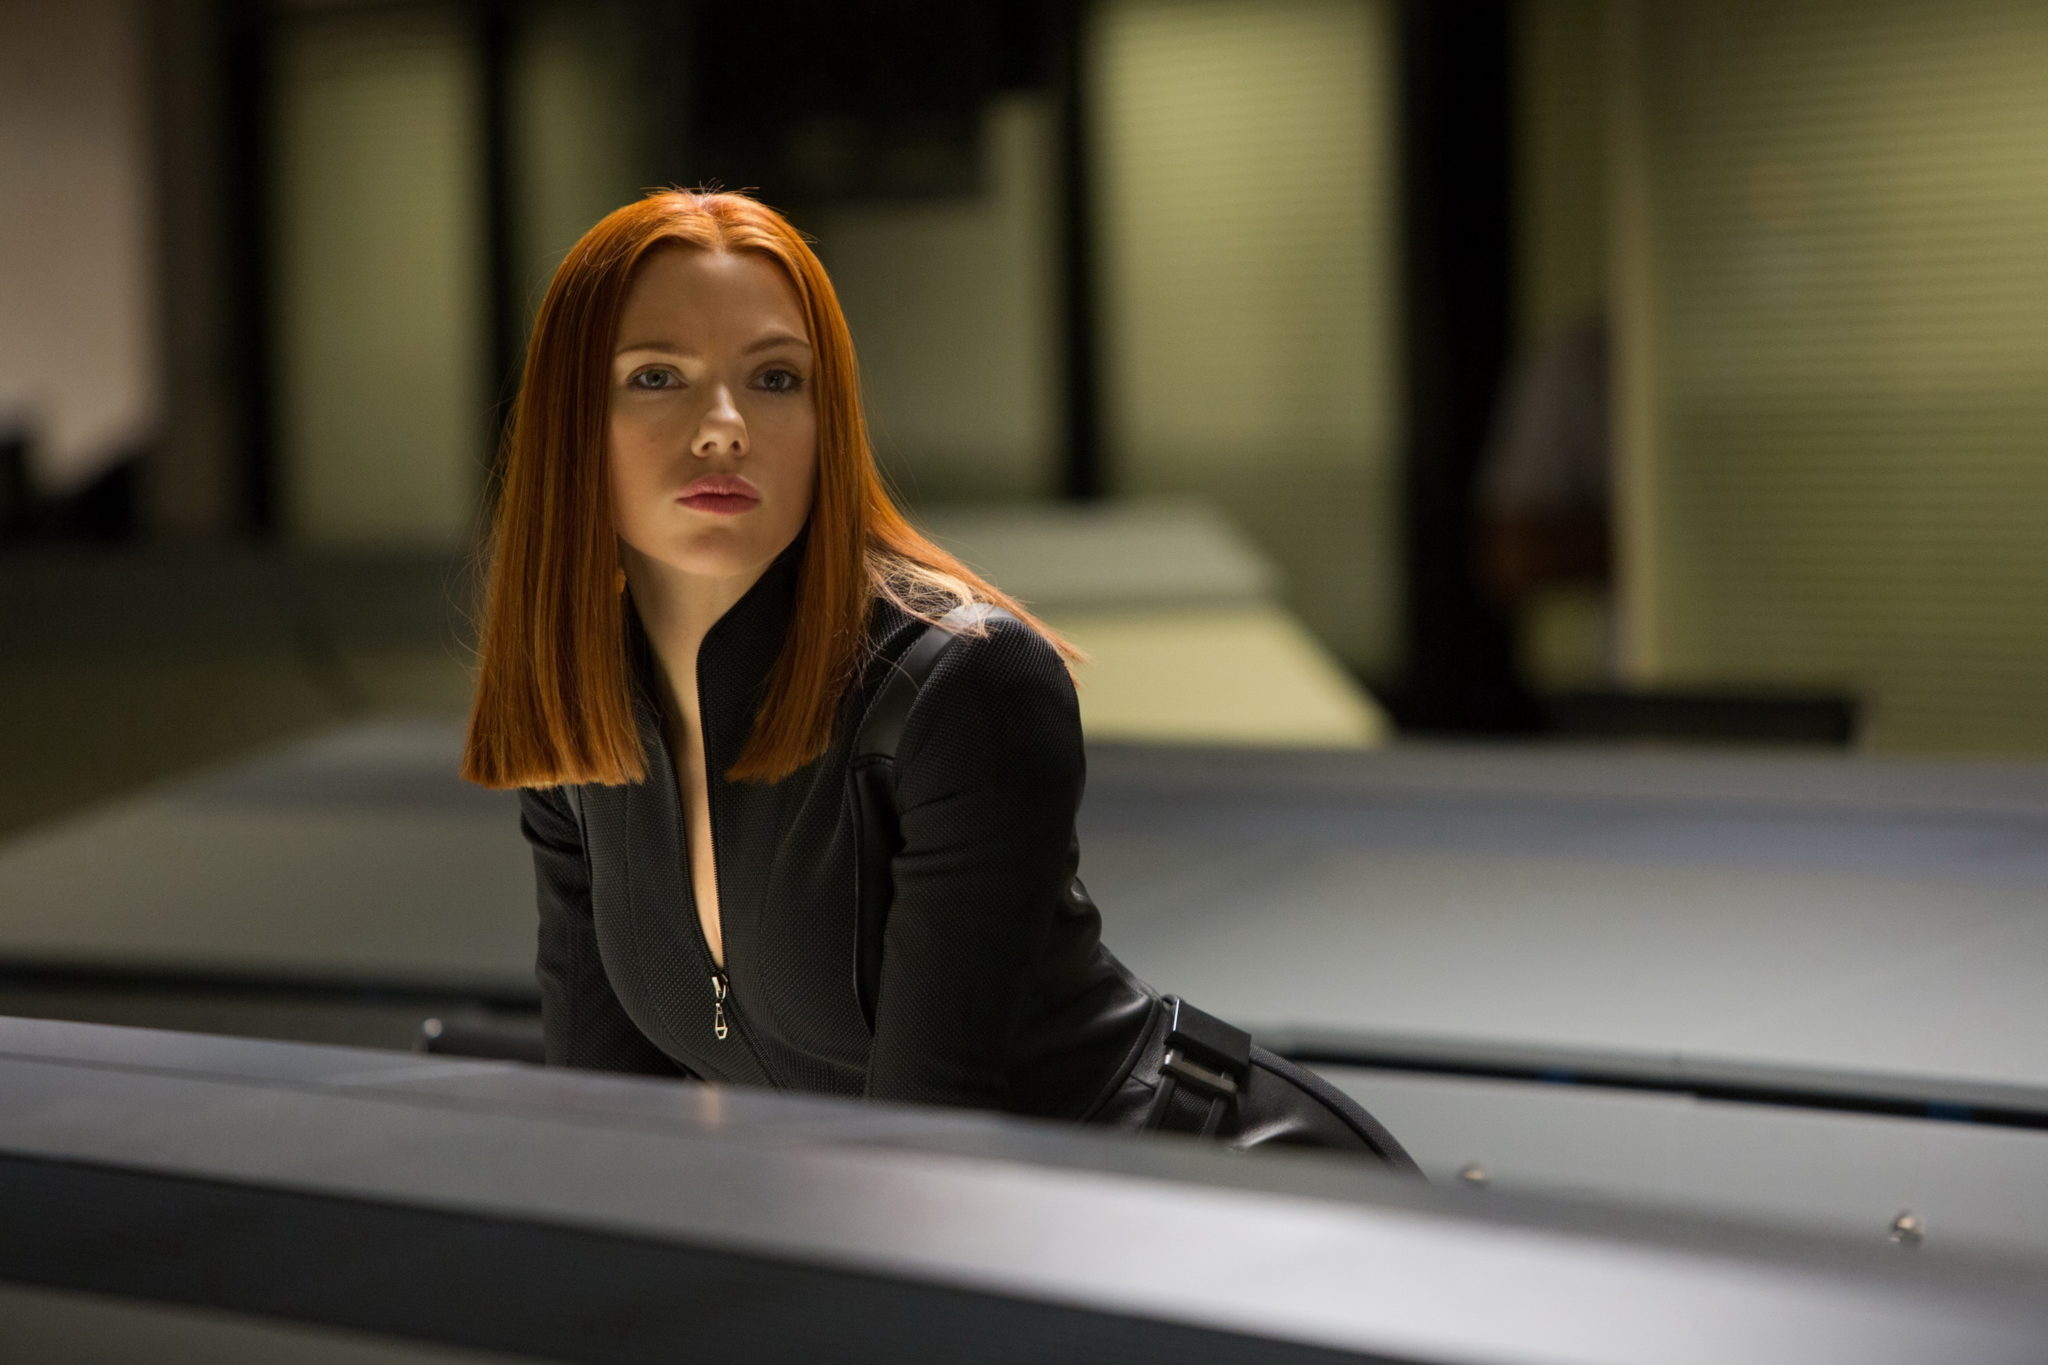 Black Widow Scarlet Johansson 2